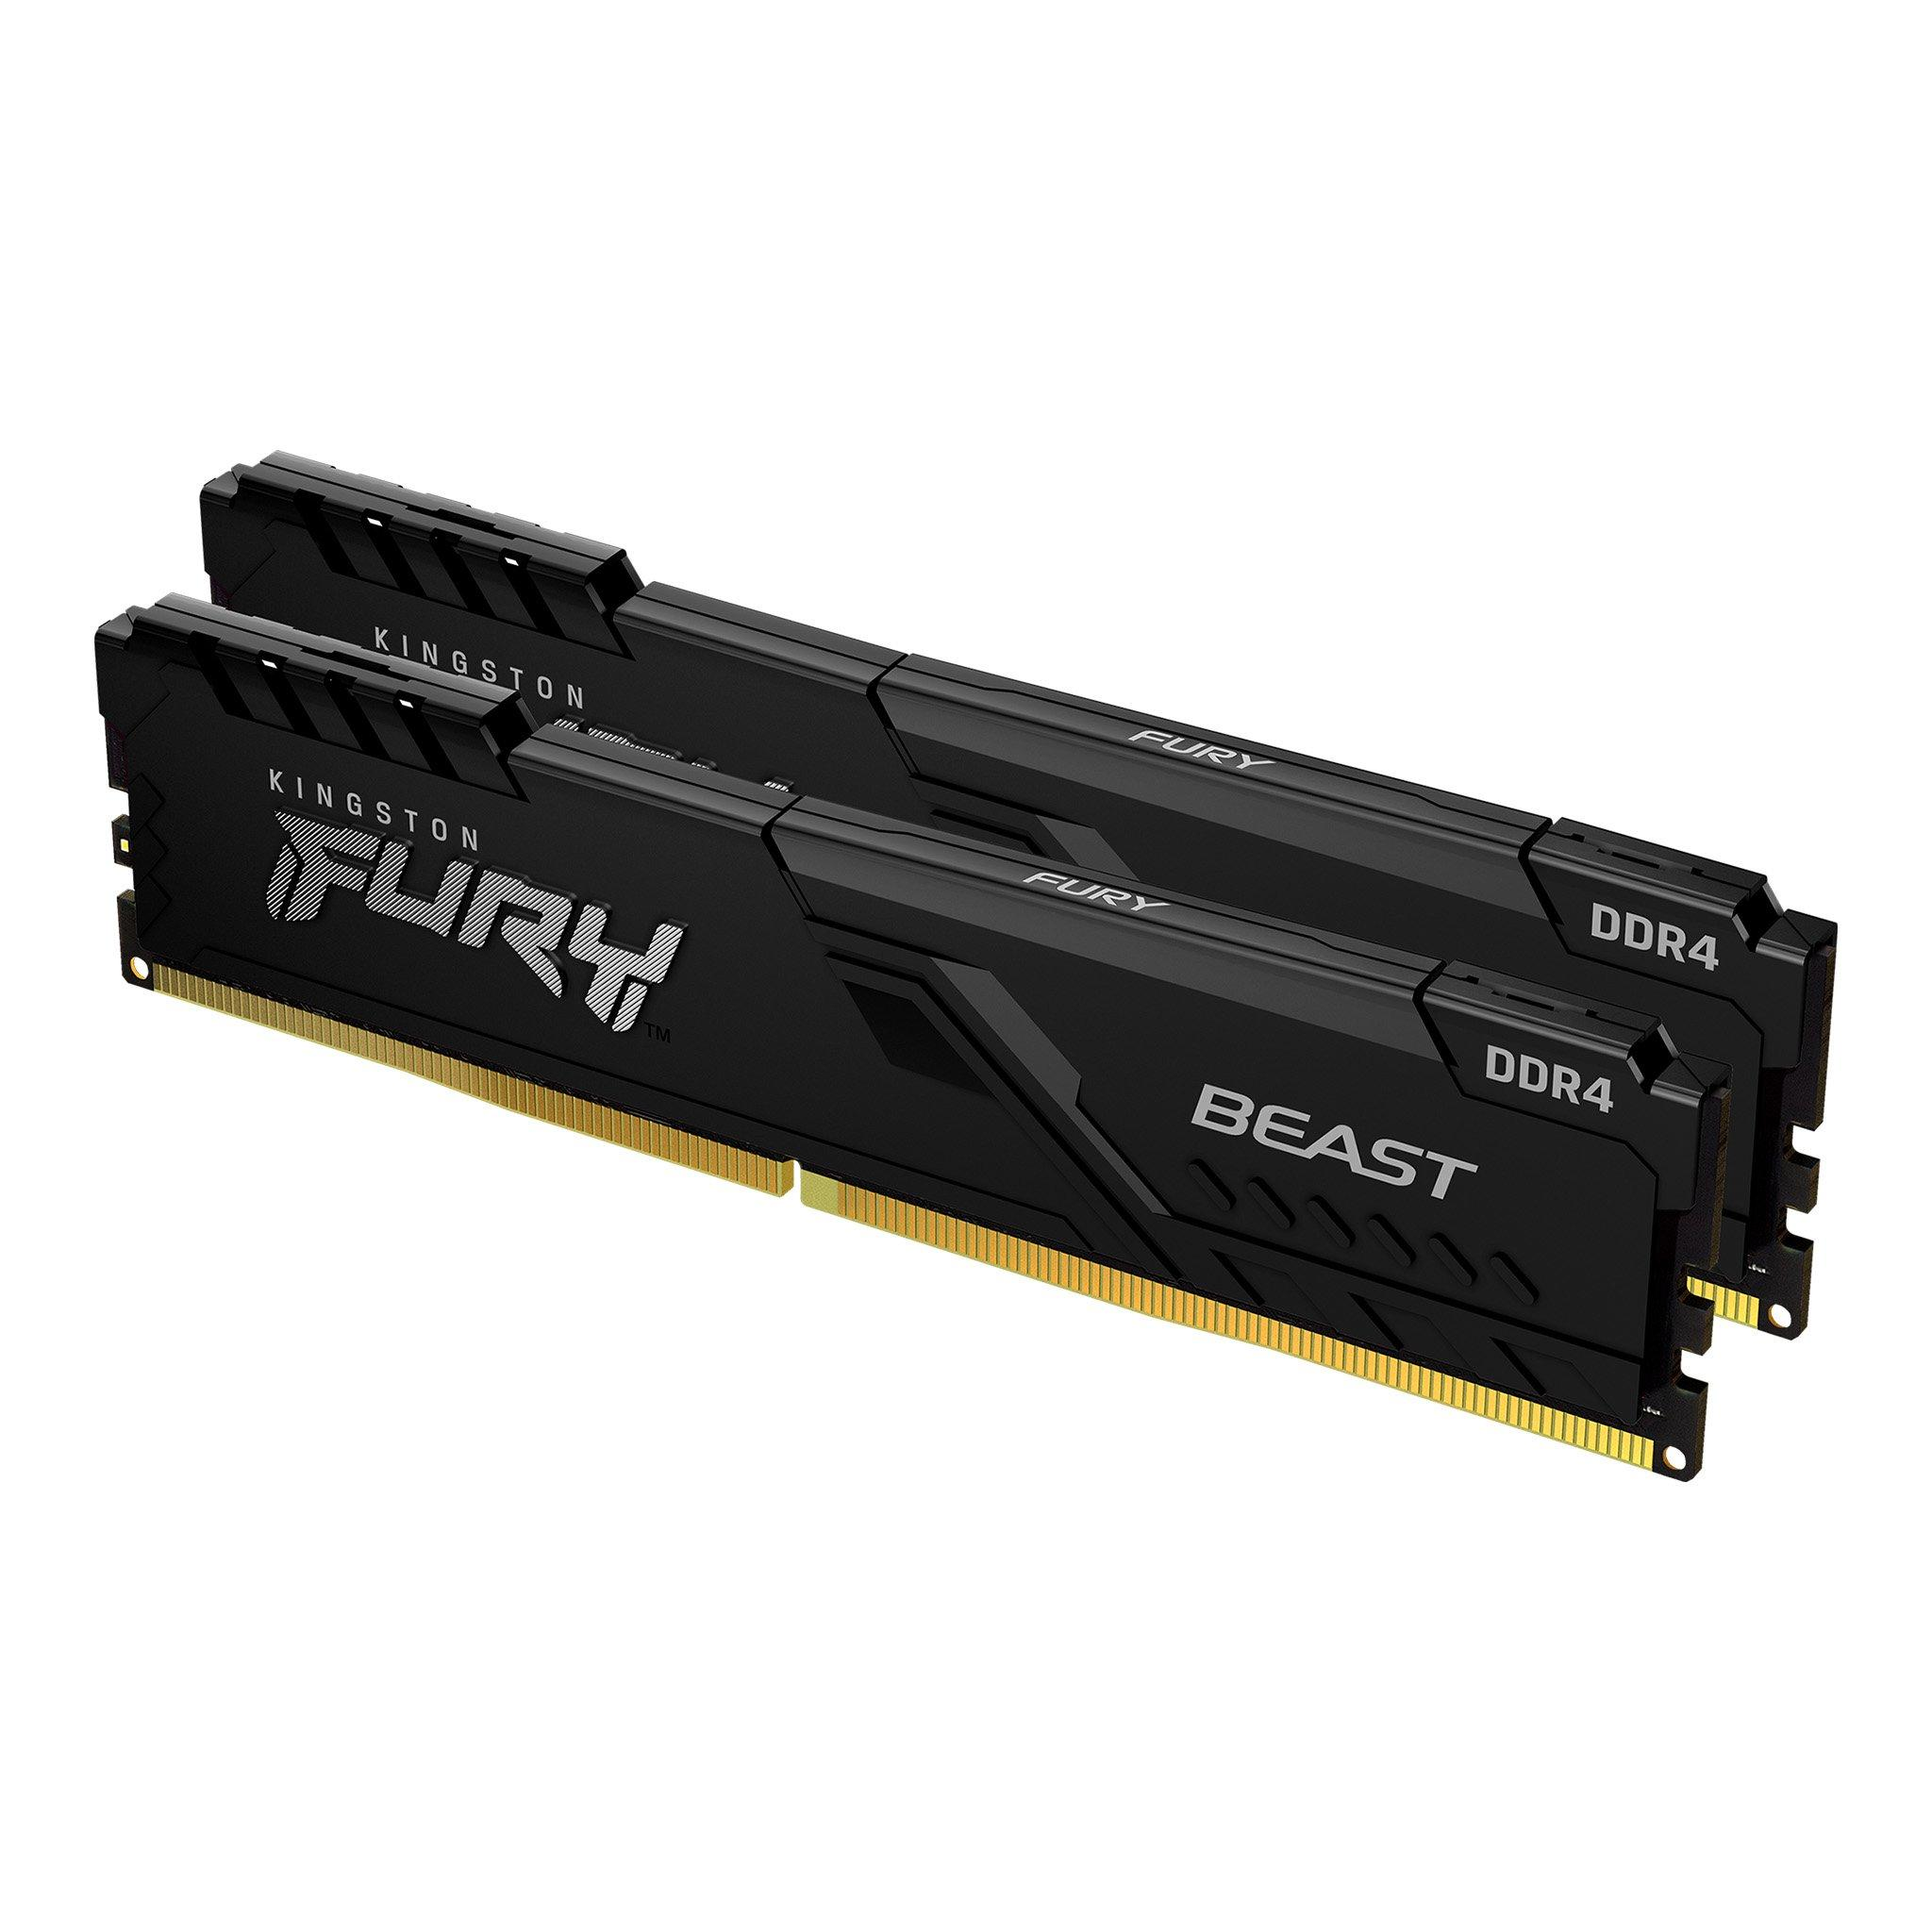 Памет Kingston FURY Beast Black 64GB(2x32GB) DDR4 PC4-28800 3600MHz CL18 KF436C18BBK2/64